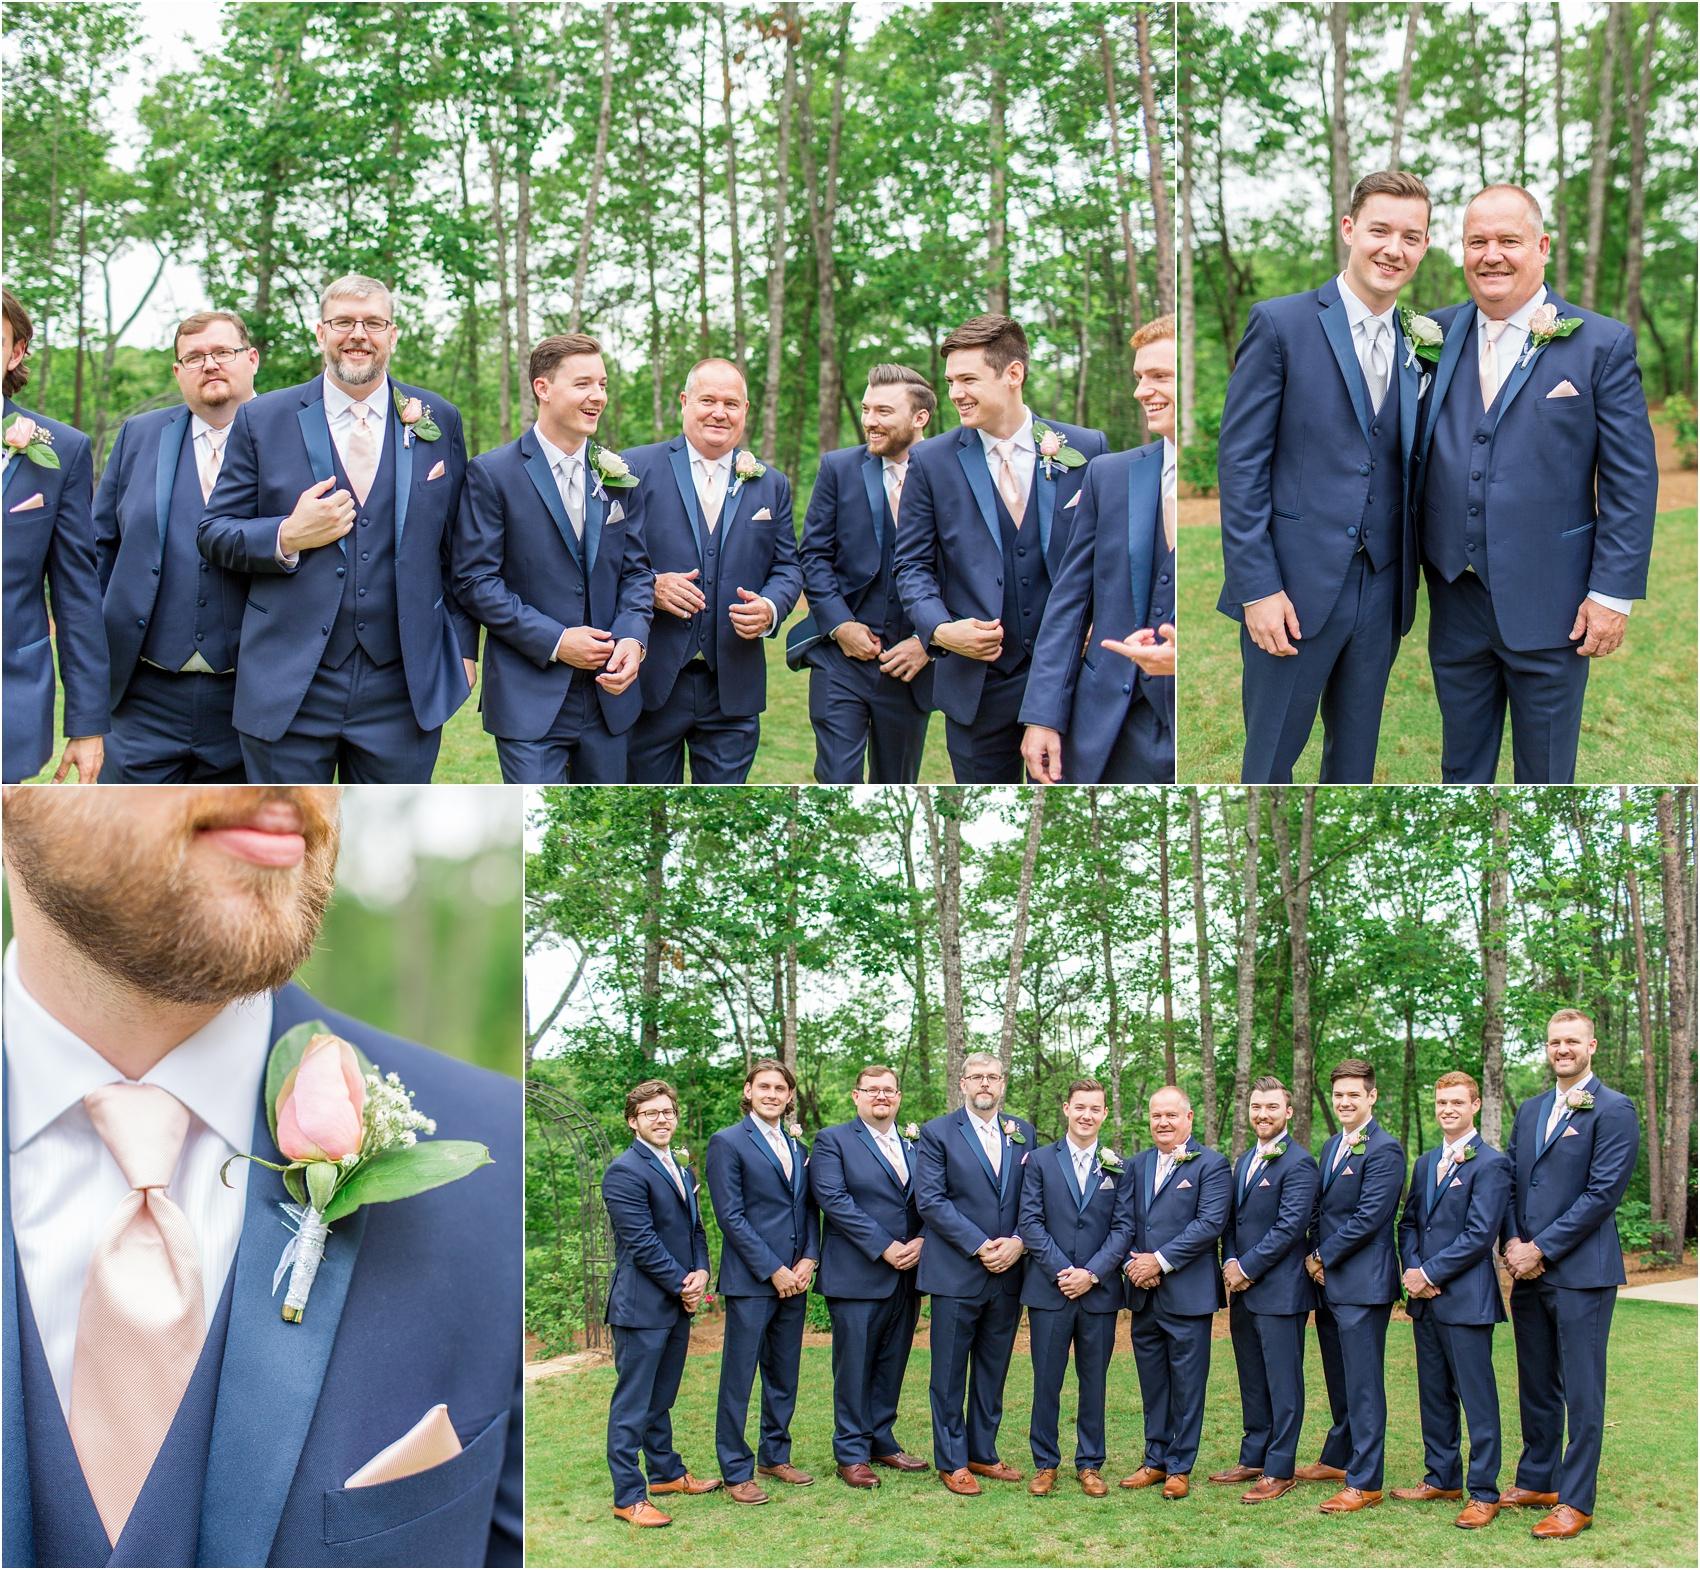 Savannah Eve Photography- Roper-Powell Wedding- Blog-18.jpg